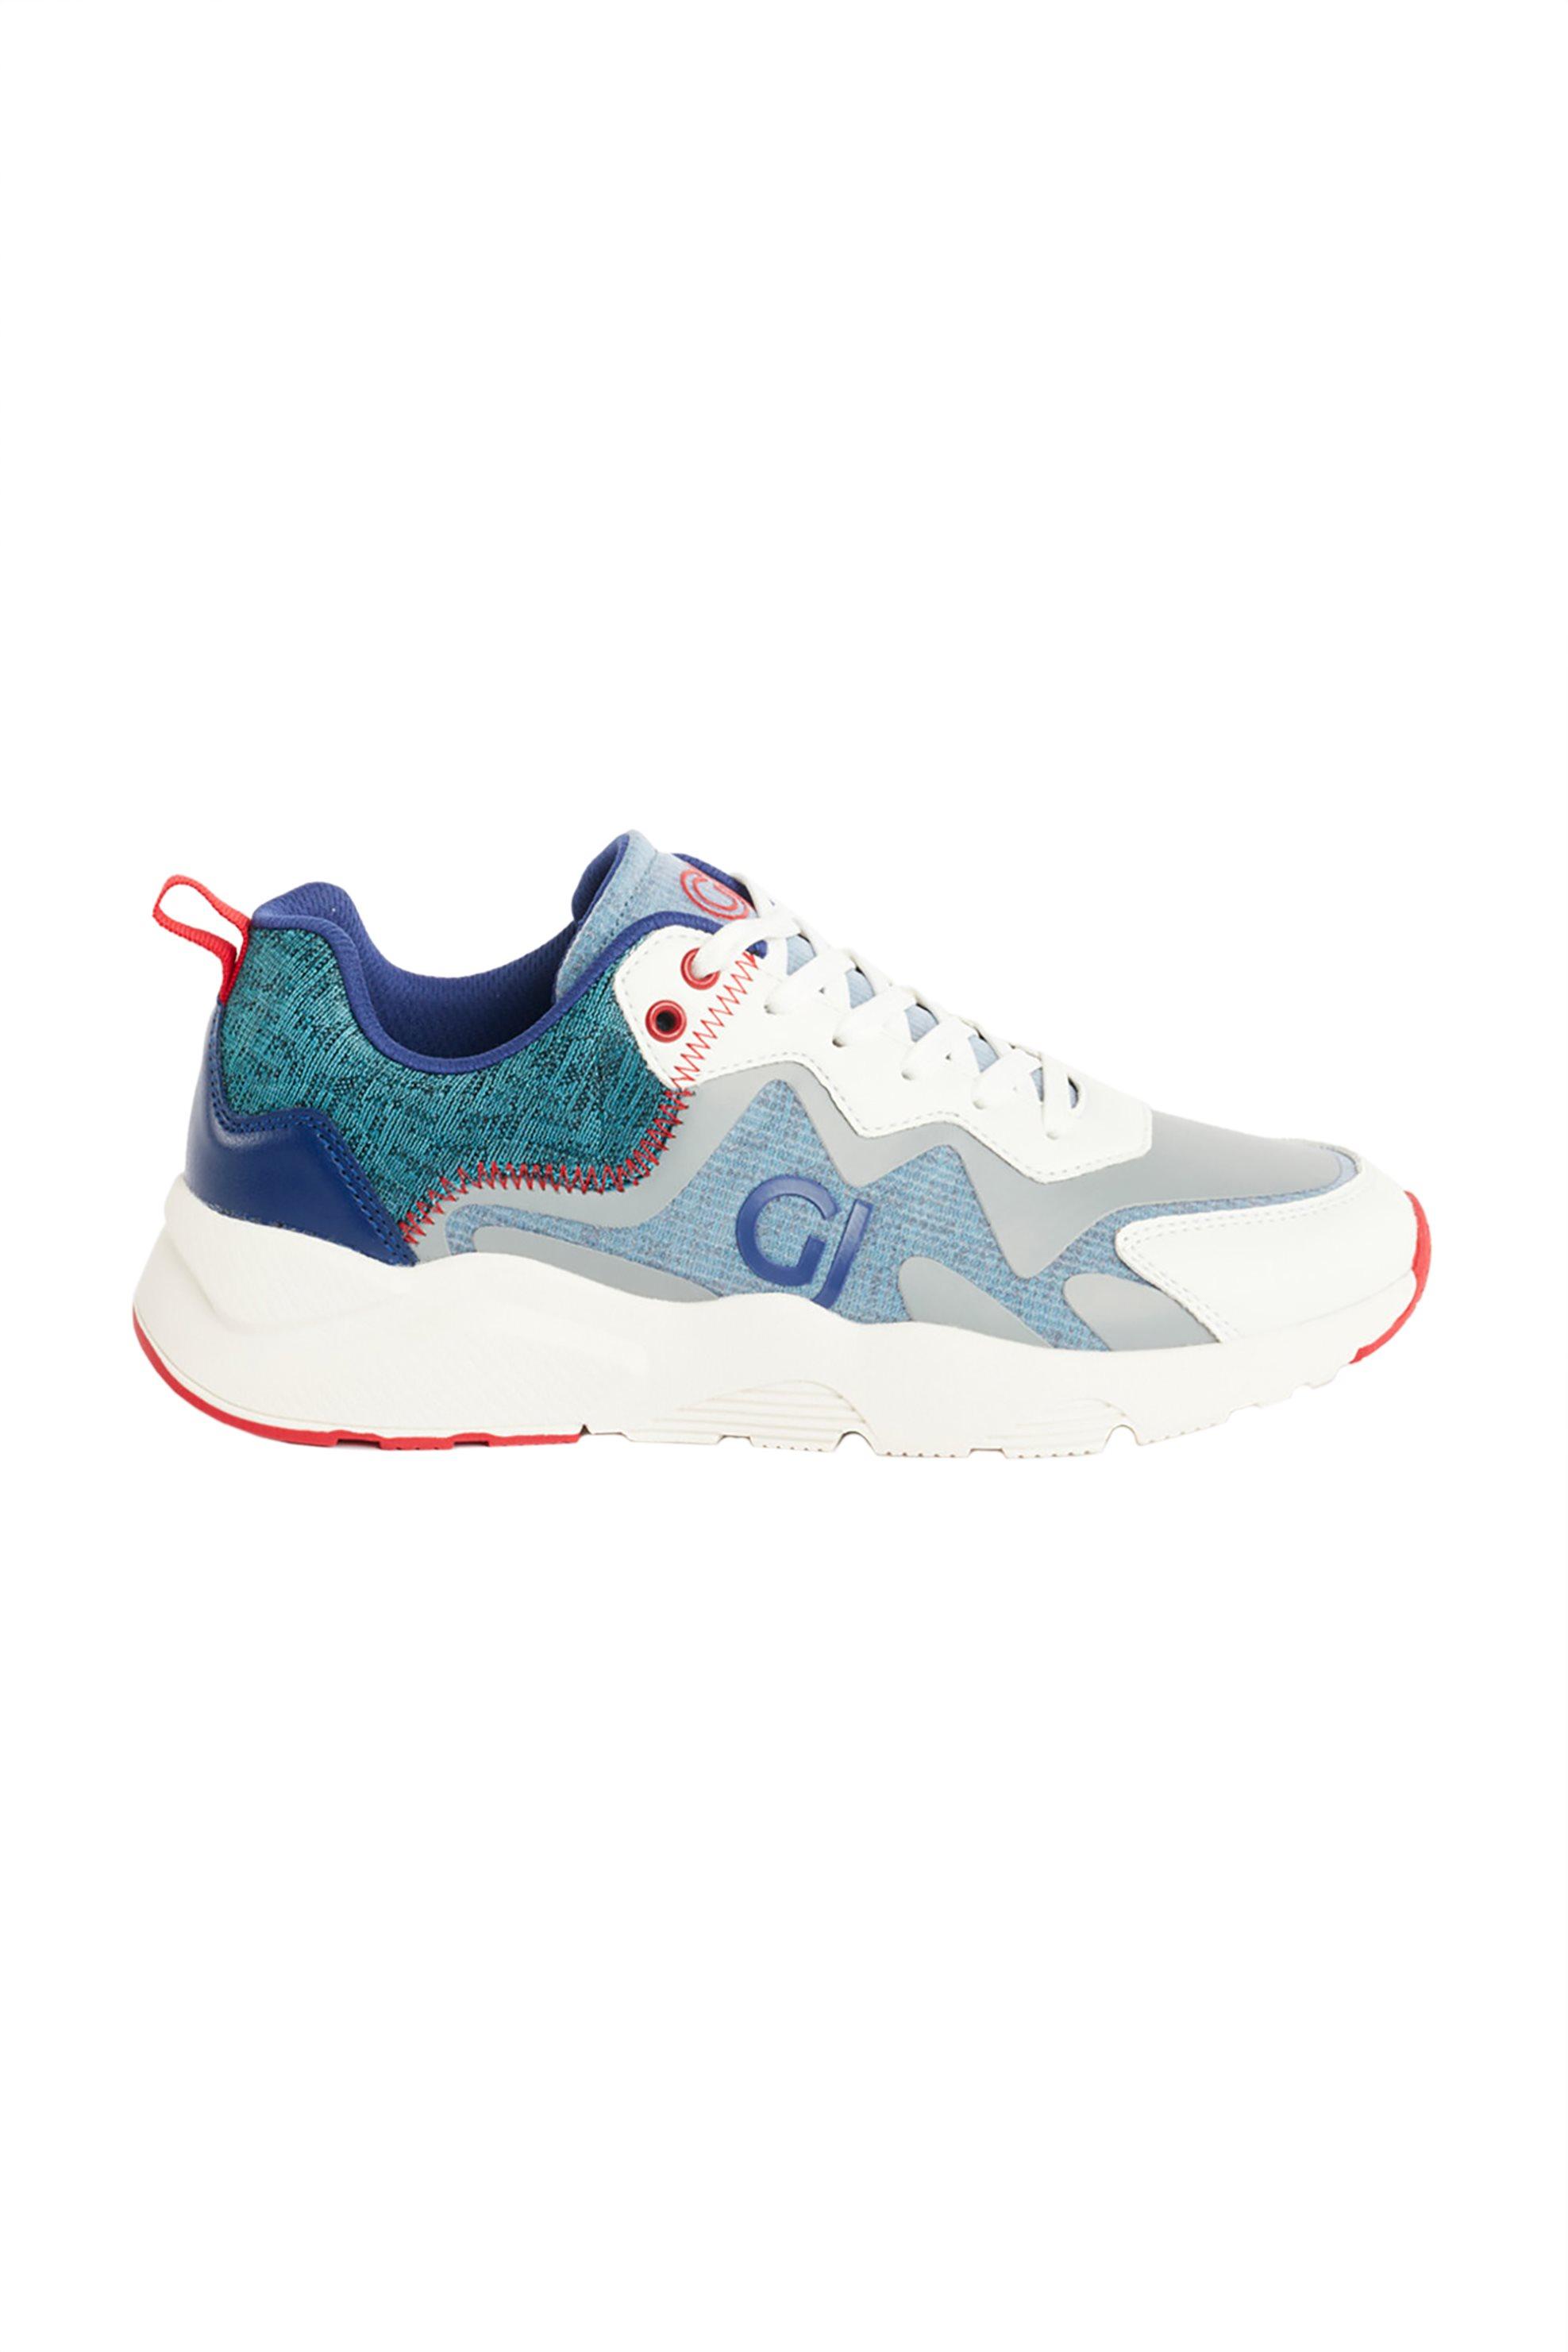 Gaudi ανδρικά sneakers με διακοσμητικές ραφές – V11-61521 – Μπλε